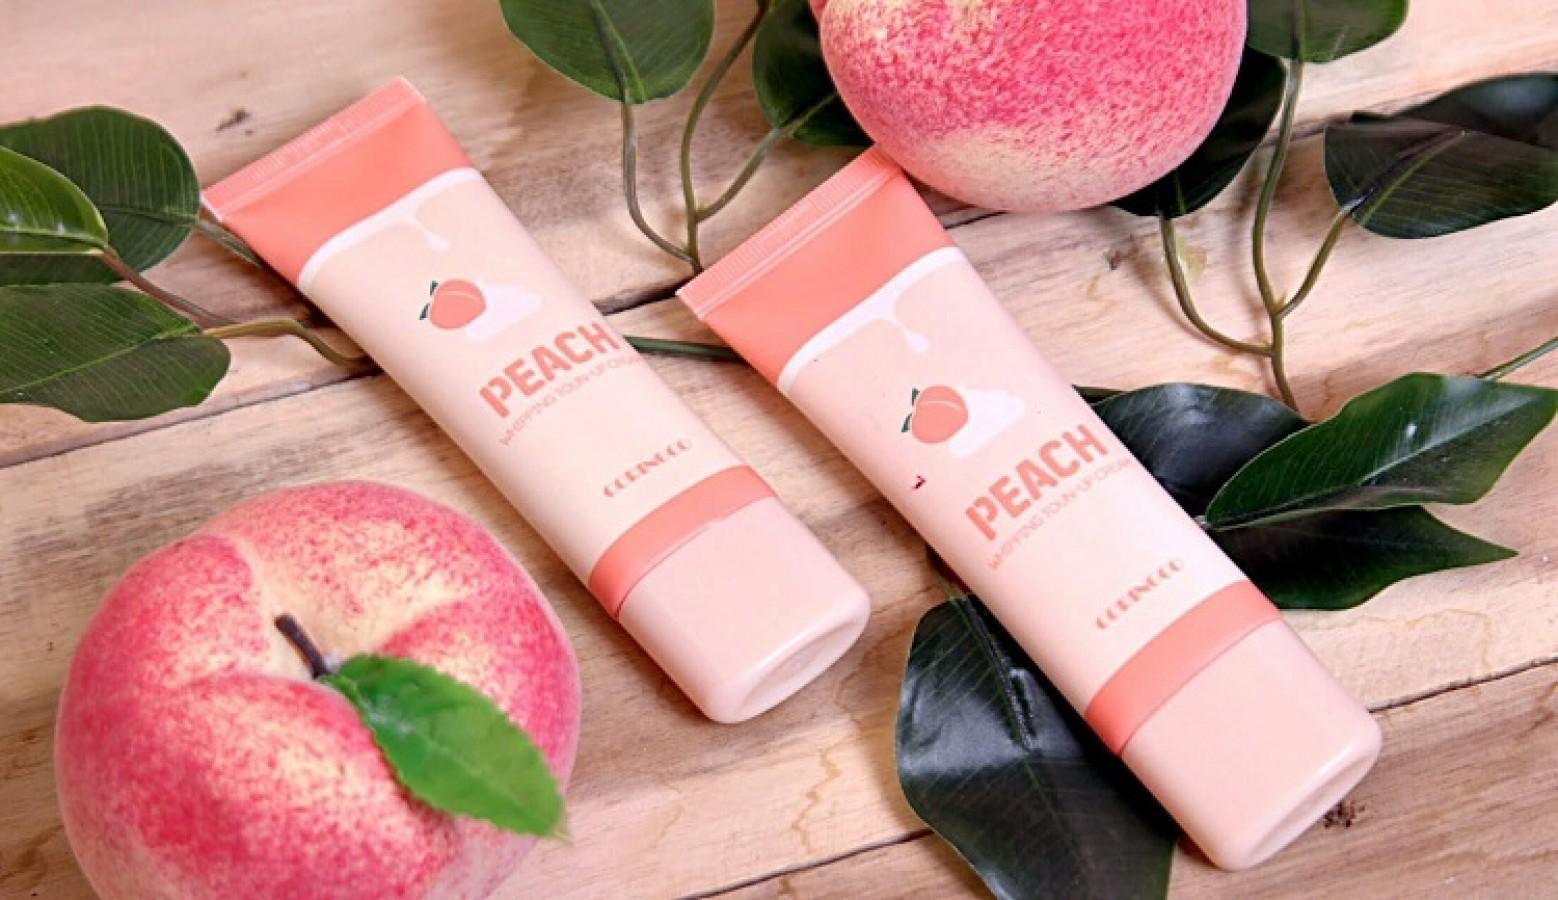 Kem Dưỡng Trắng Da Coringco Peach Whipping Tone Up Cream